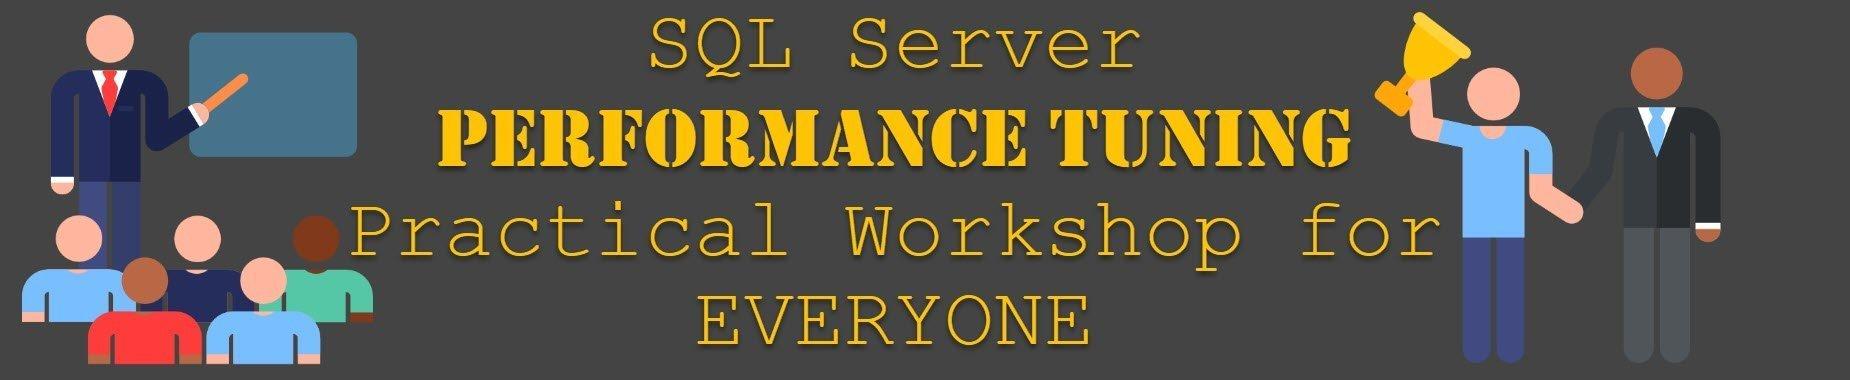 Price Increase Alert - SQL Server Performance Tuning Practical Workshop for EVERYONE - April 23, 2019 performancetuningforeveryone2